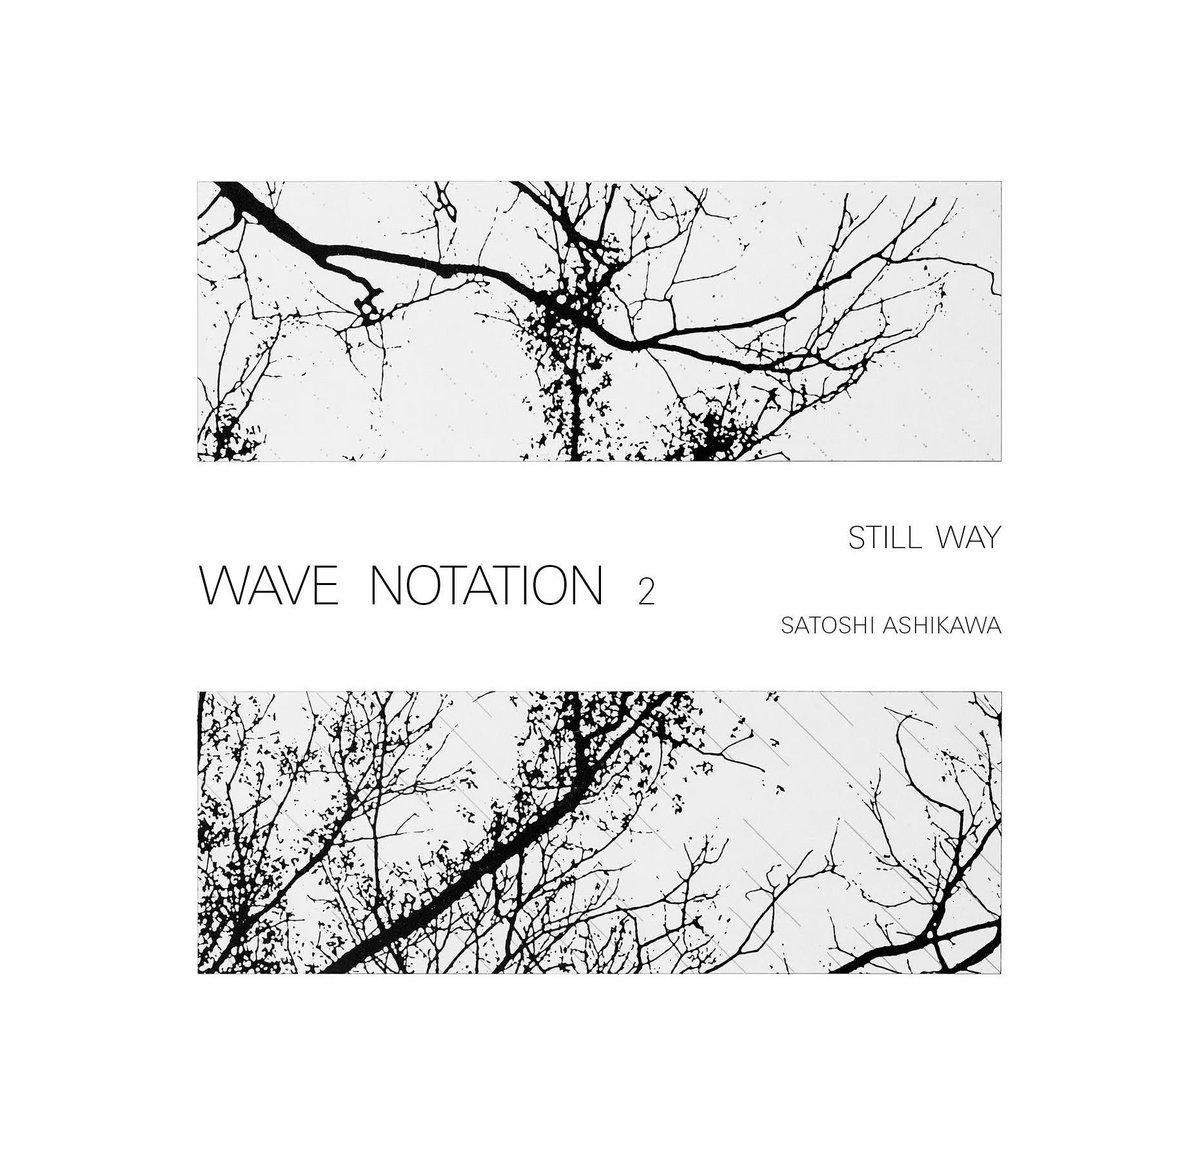 Laistigh den Ghleo | WRWTFWW Records